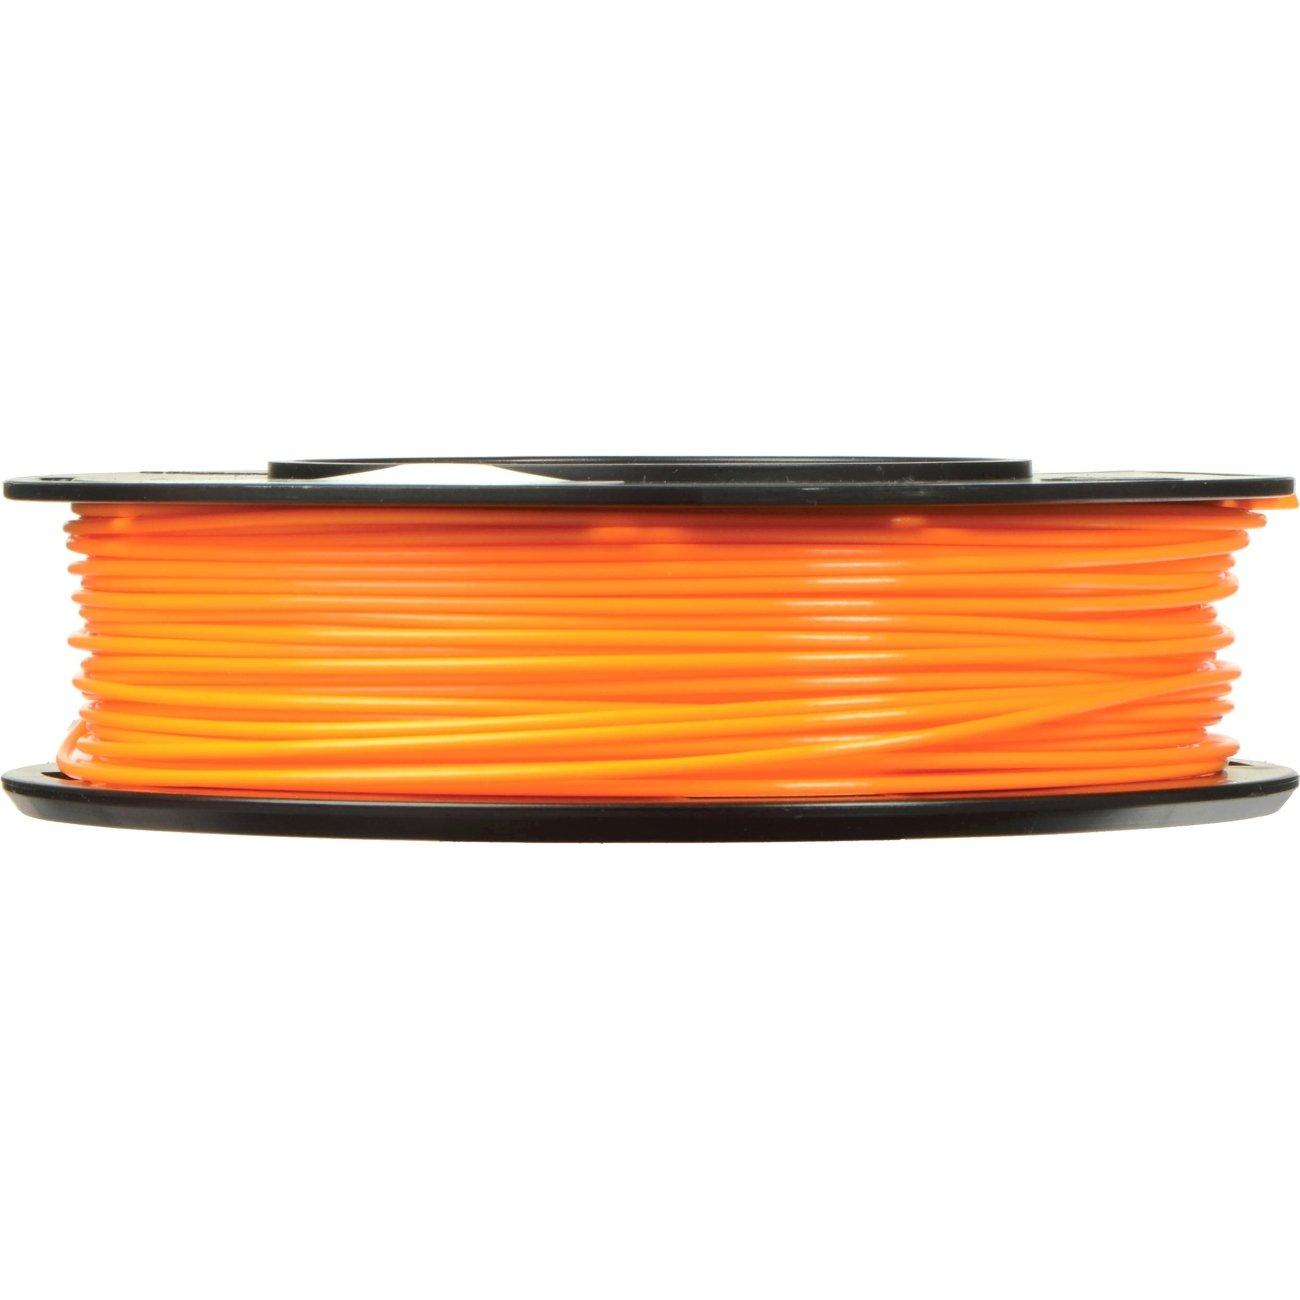 MakerBot PLA Filament, 1.75 mm Diameter, Small Spool, Neon Orange MP06051